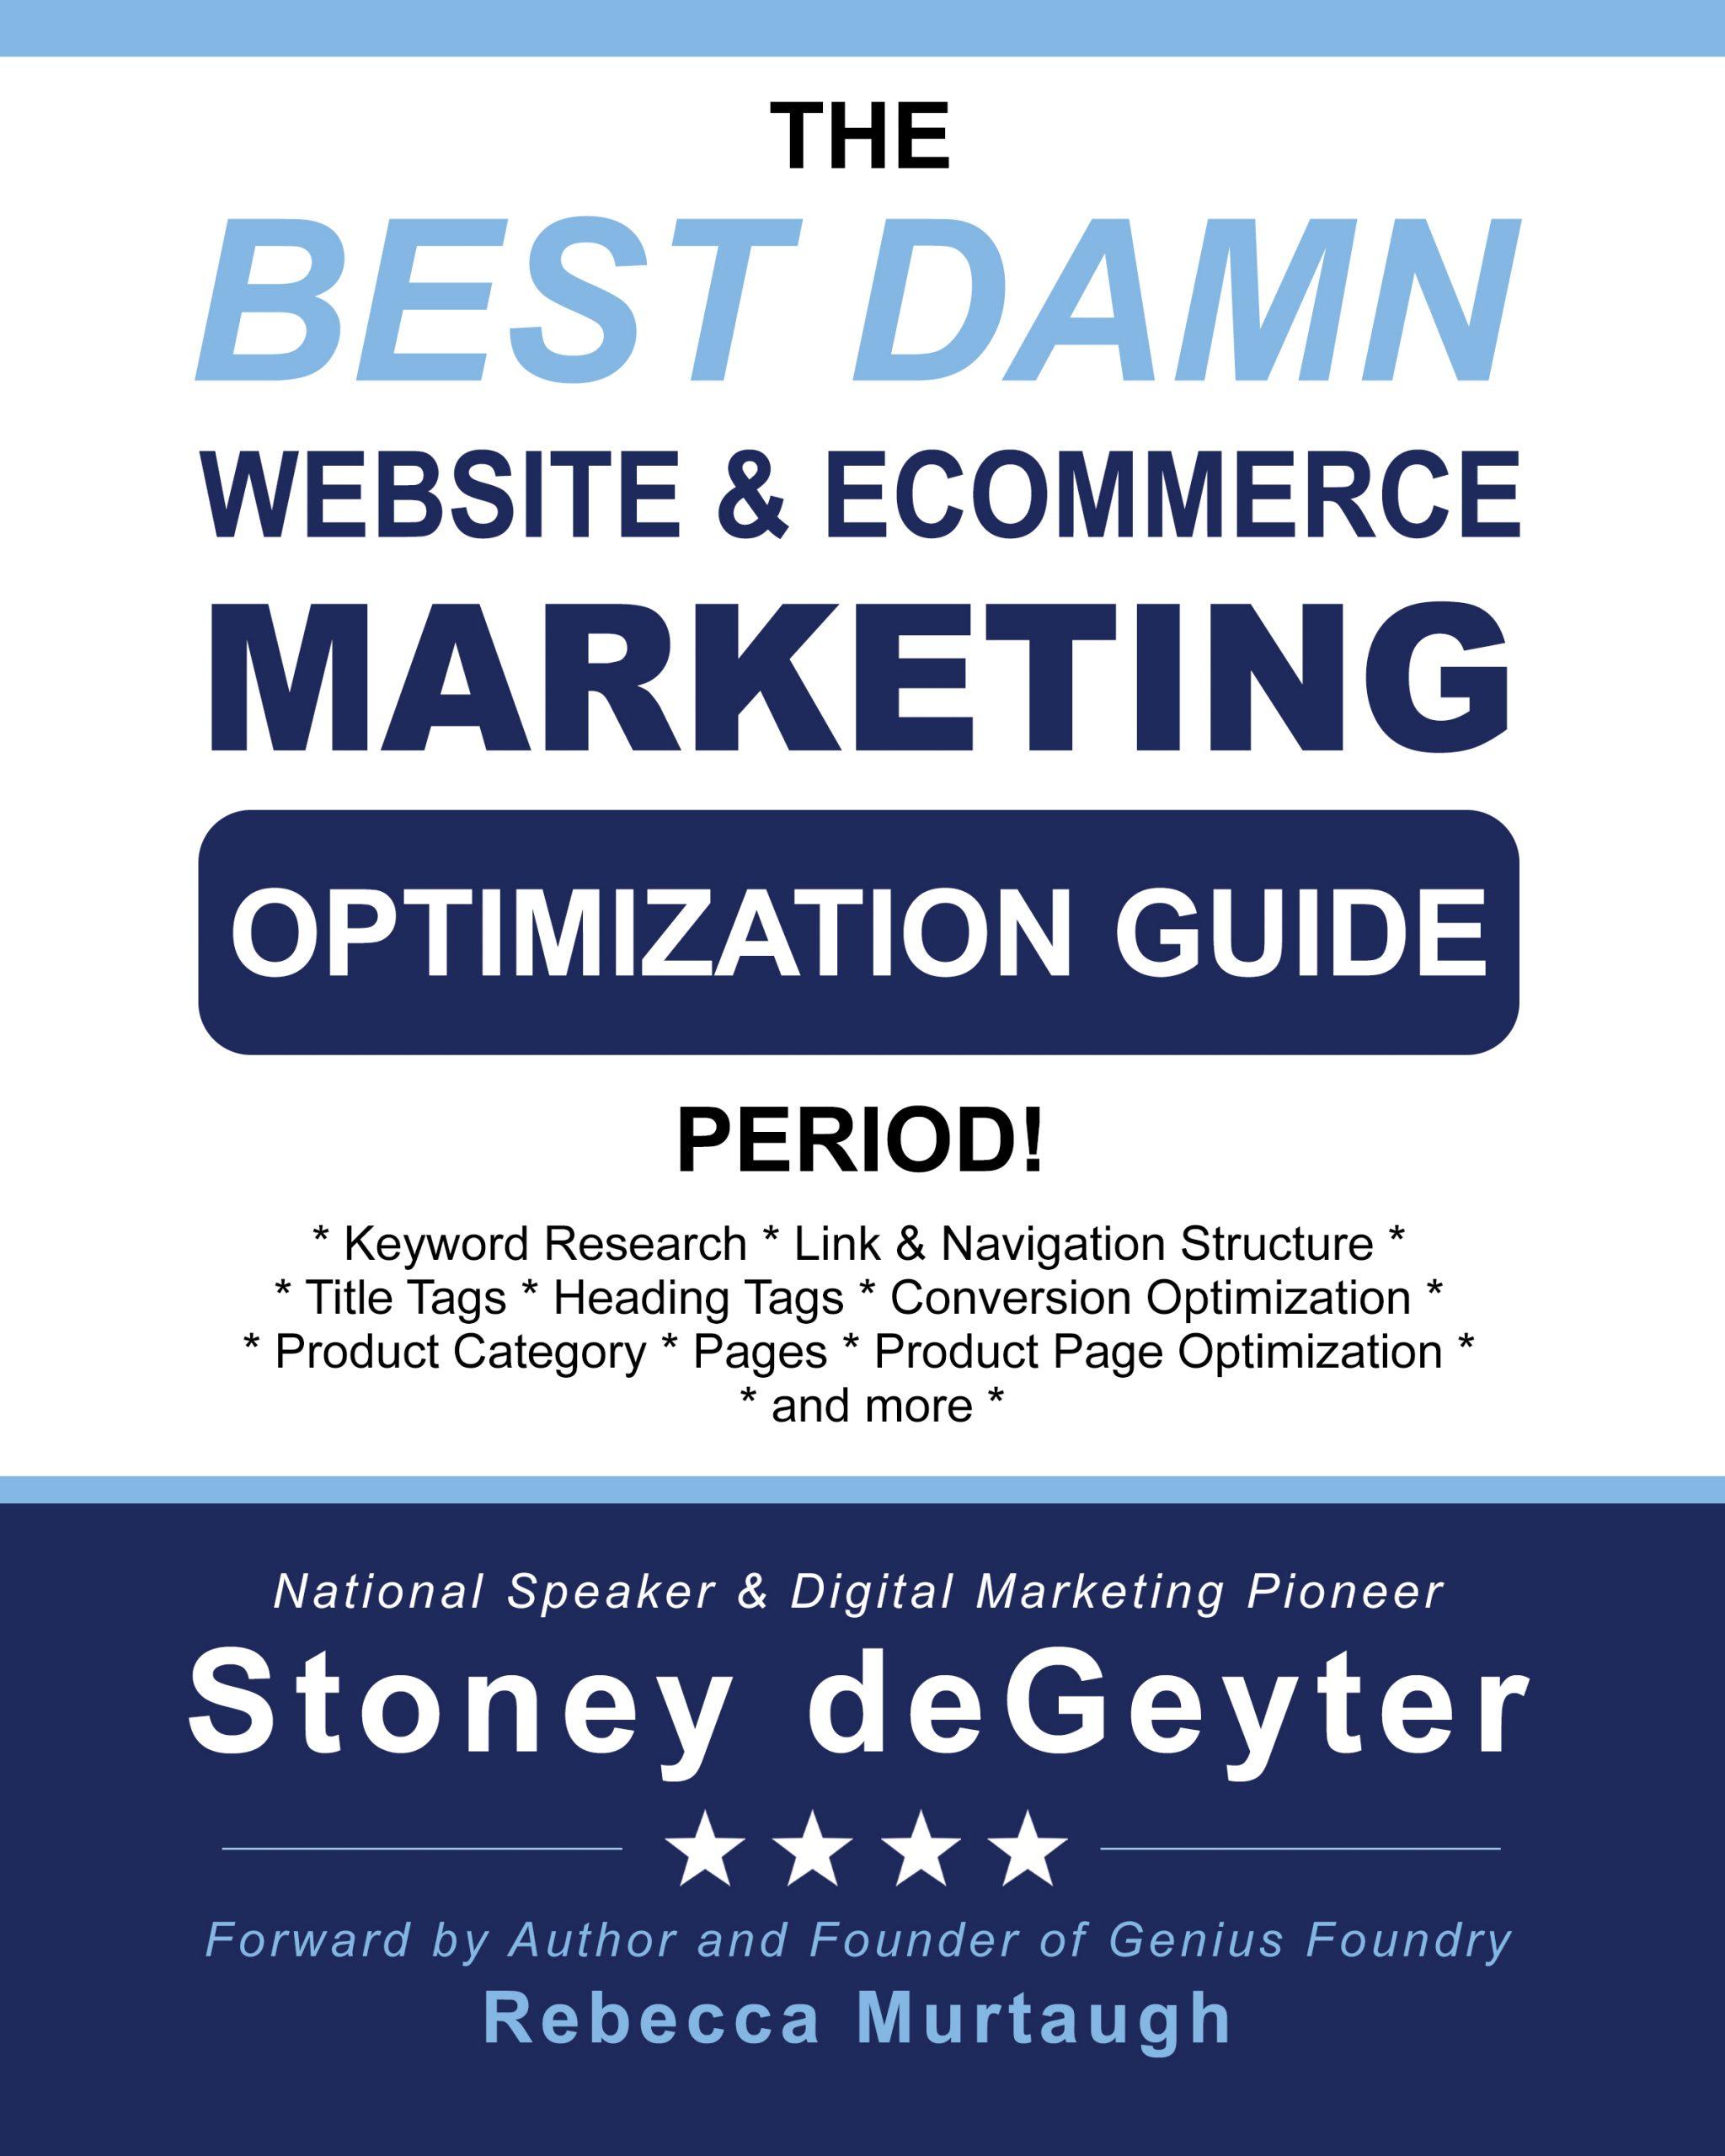 The Best Damn Website & Ecommerce Marketing Optimization Guide, Period!